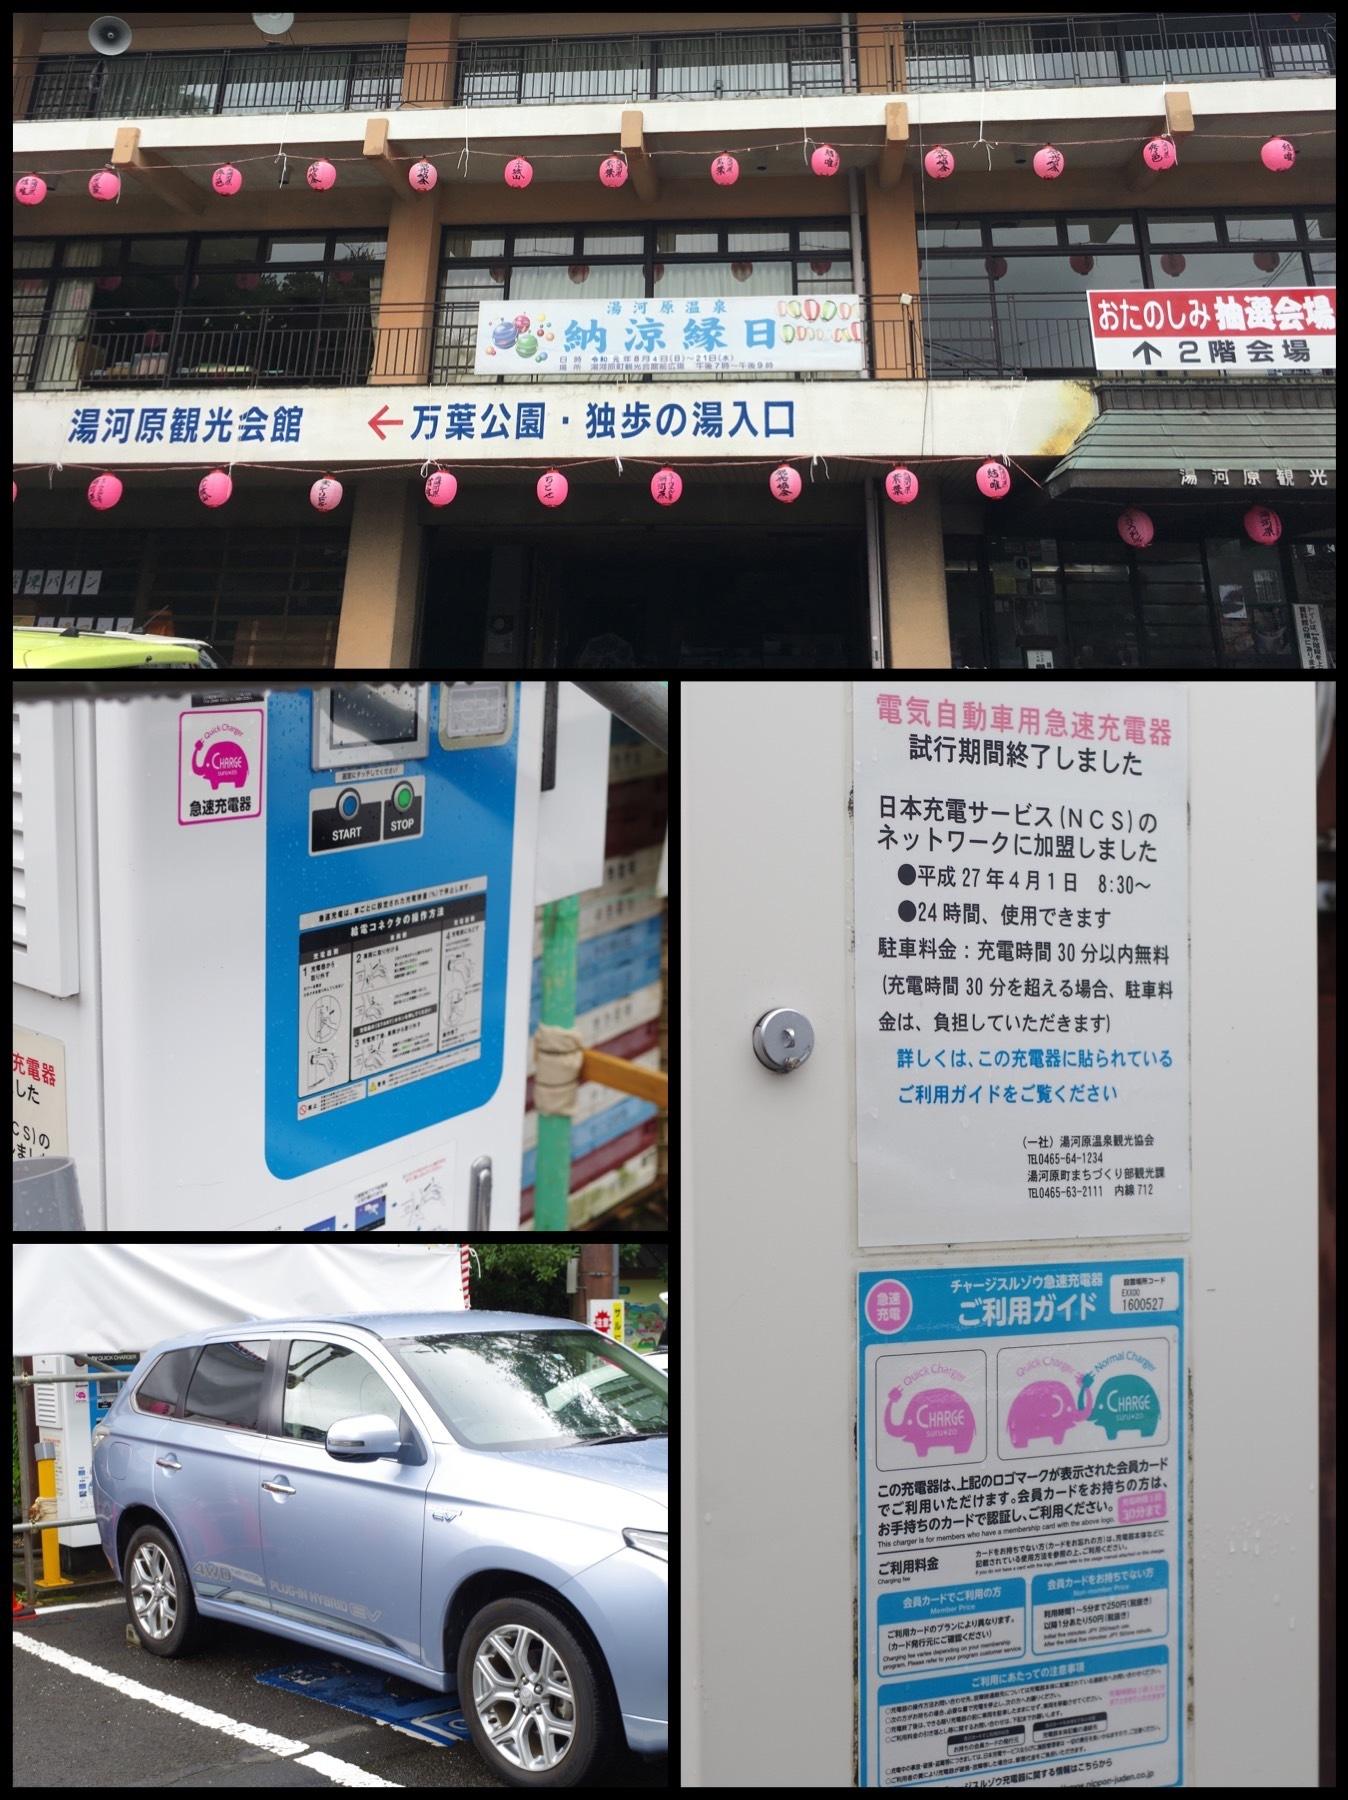 EV充電スポット 湯河原観光会館